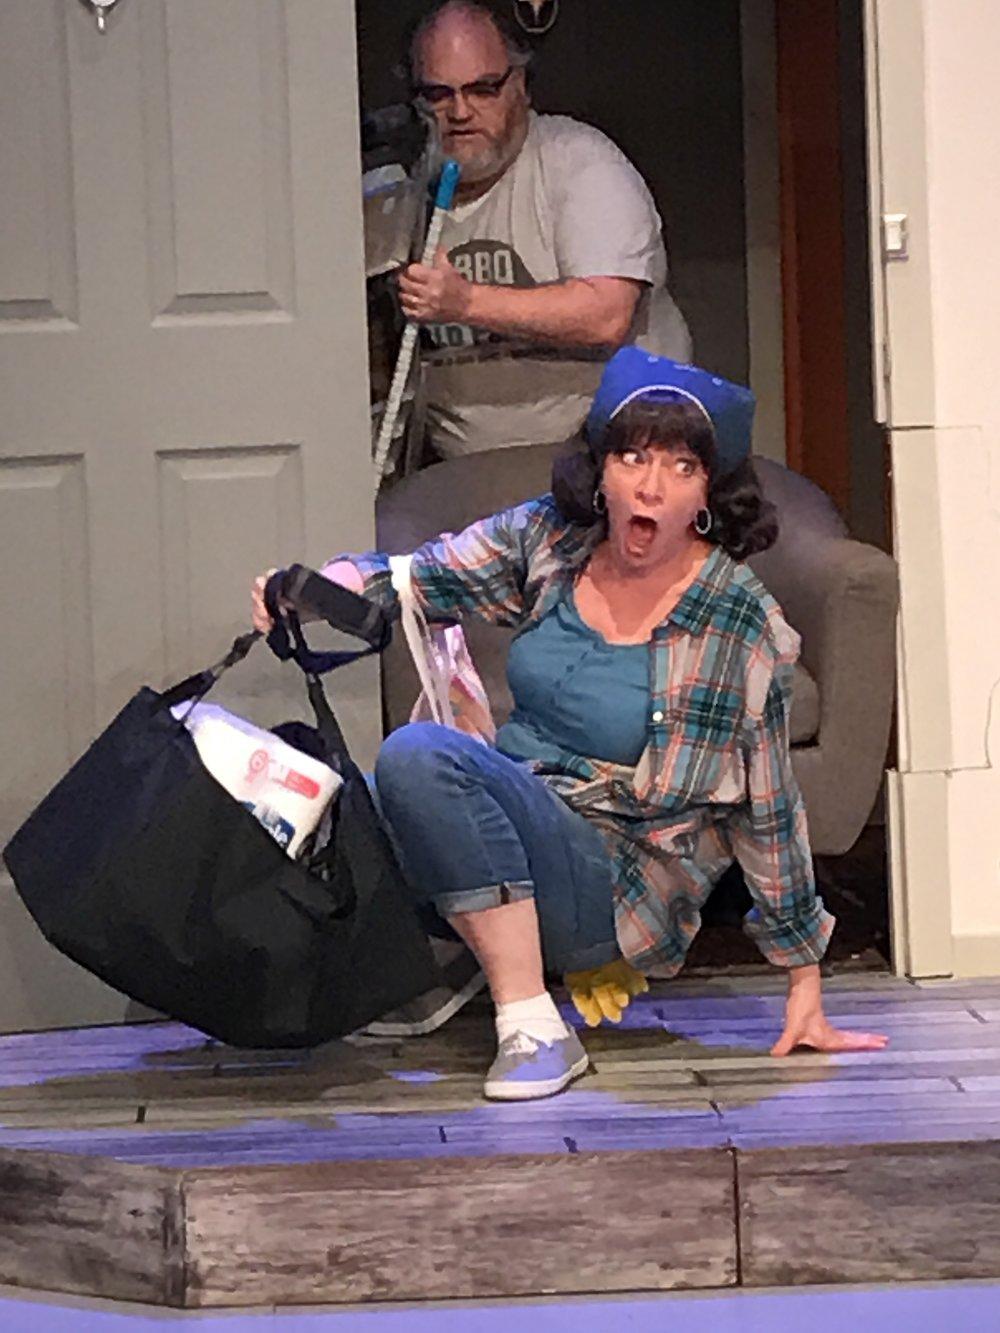 In doorway: Shael Risman, On floor: Nancy Gleed, Photo courtesy of Ted Niles.